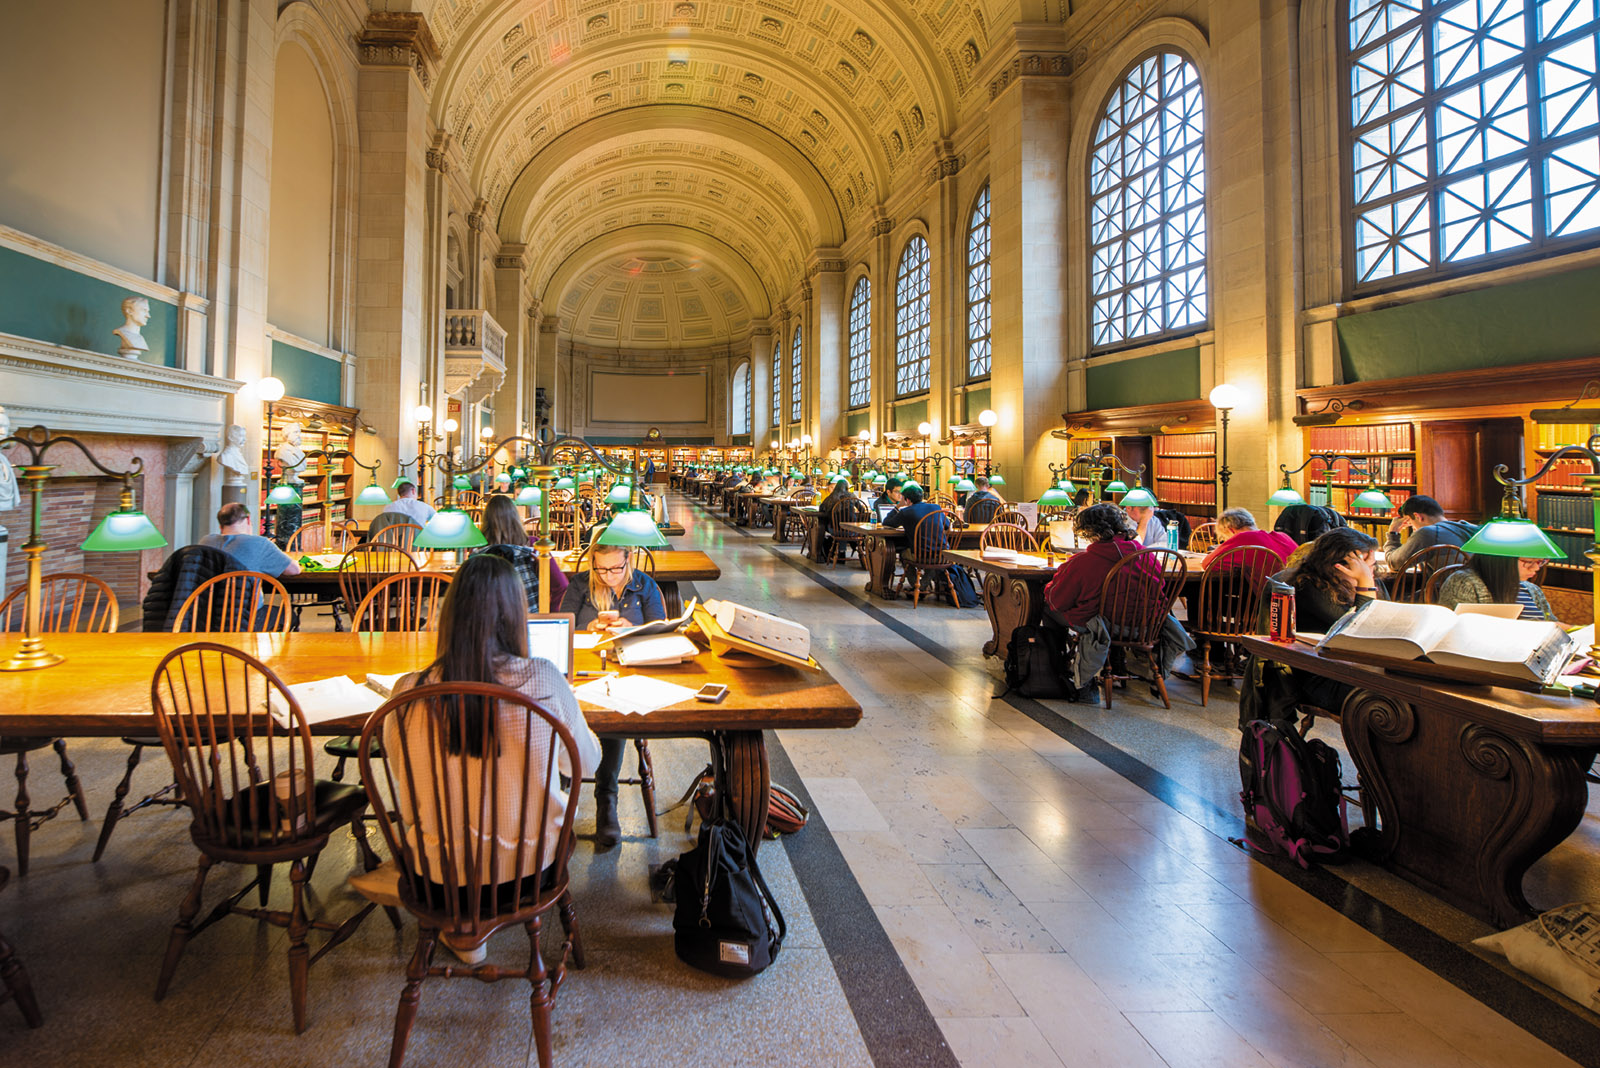 Bates Hall reading room, Boston Public Library, 2017